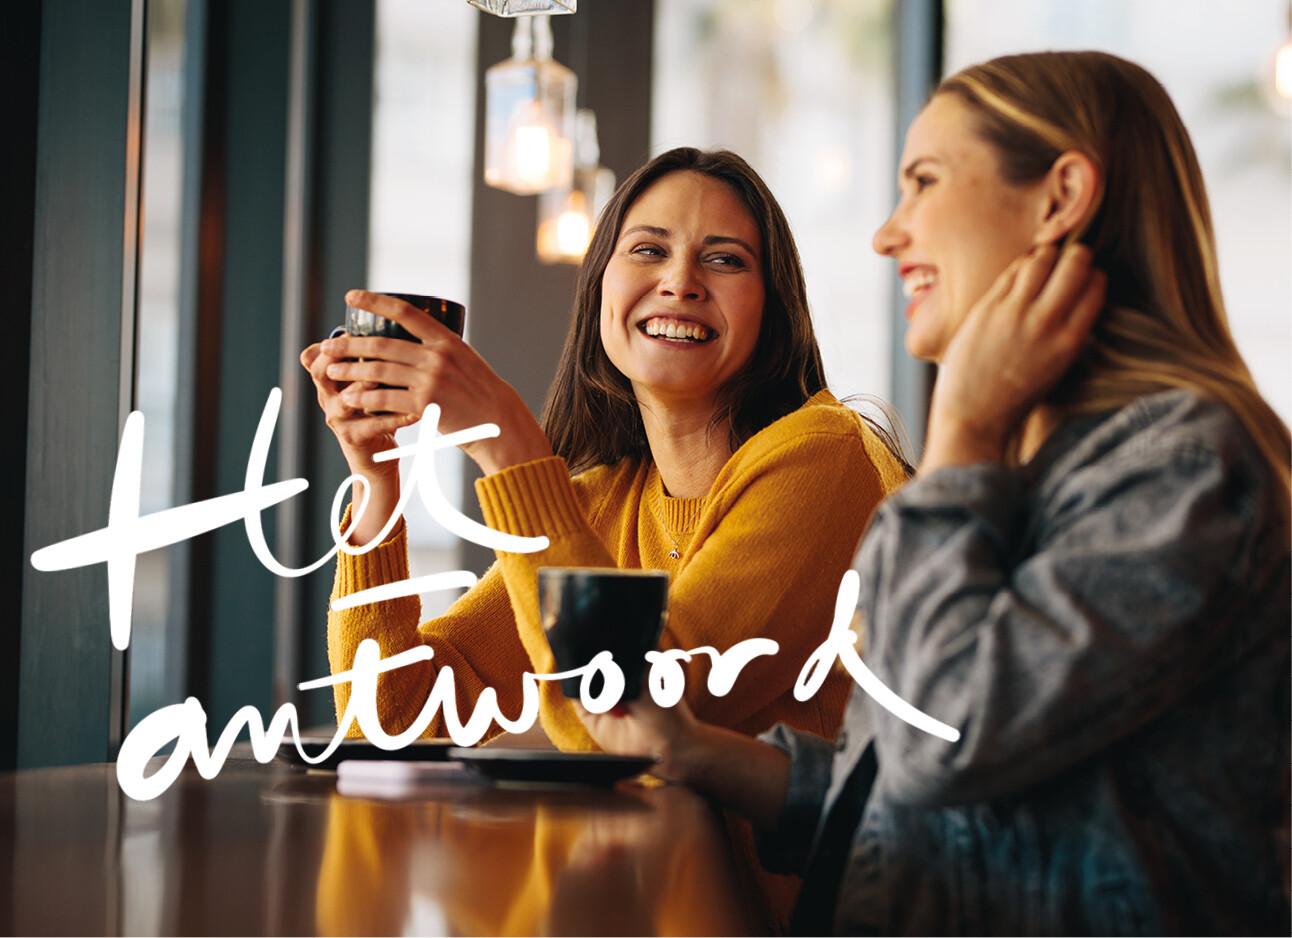 vrouwen praten en koffie drinken